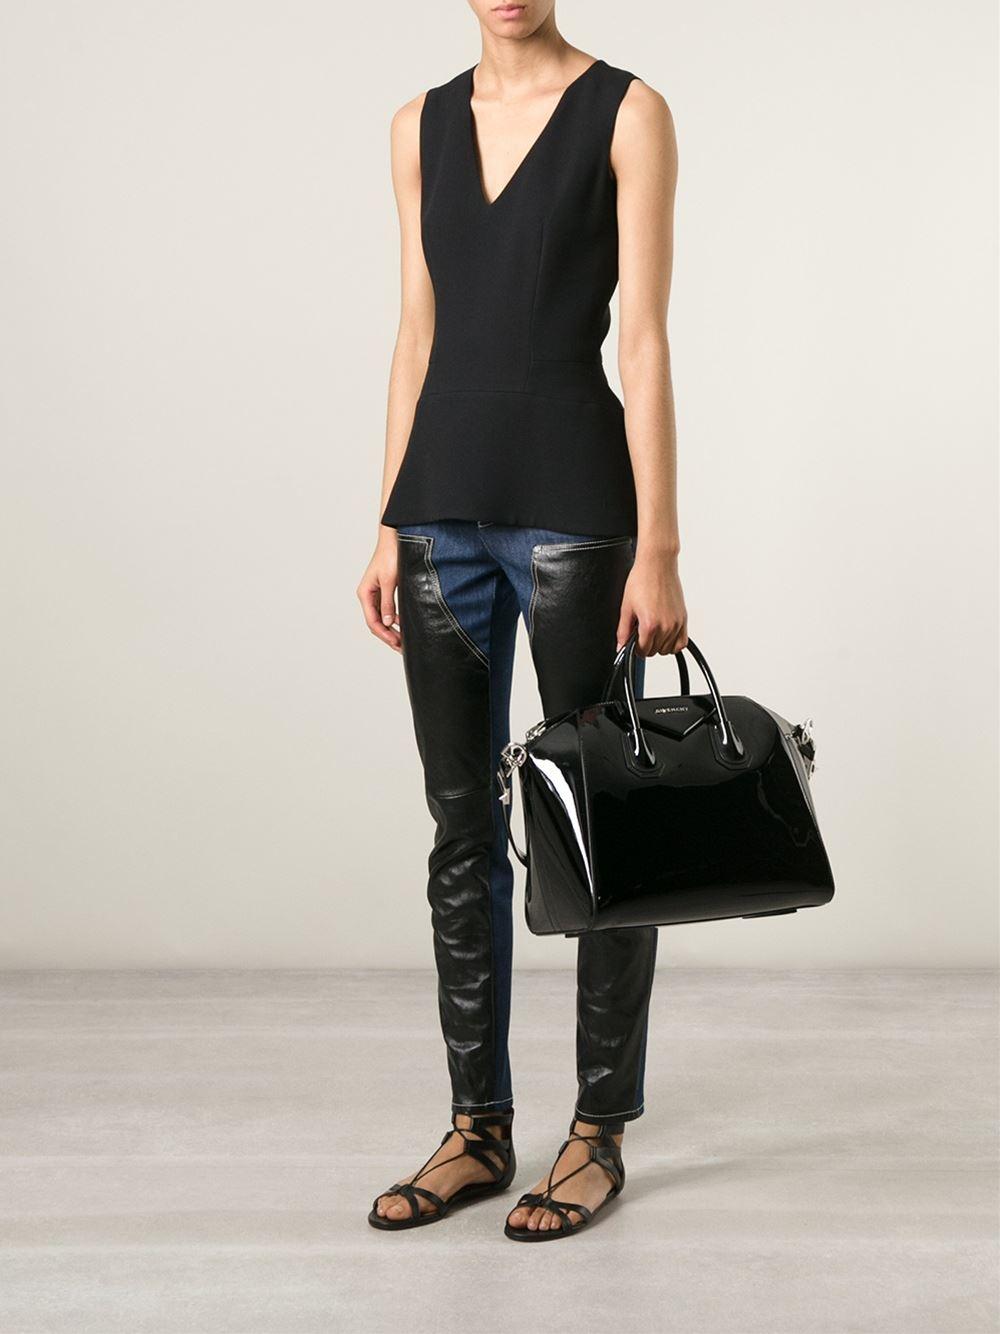 lyst givenchy antigona medium patent leather tote in black. Black Bedroom Furniture Sets. Home Design Ideas